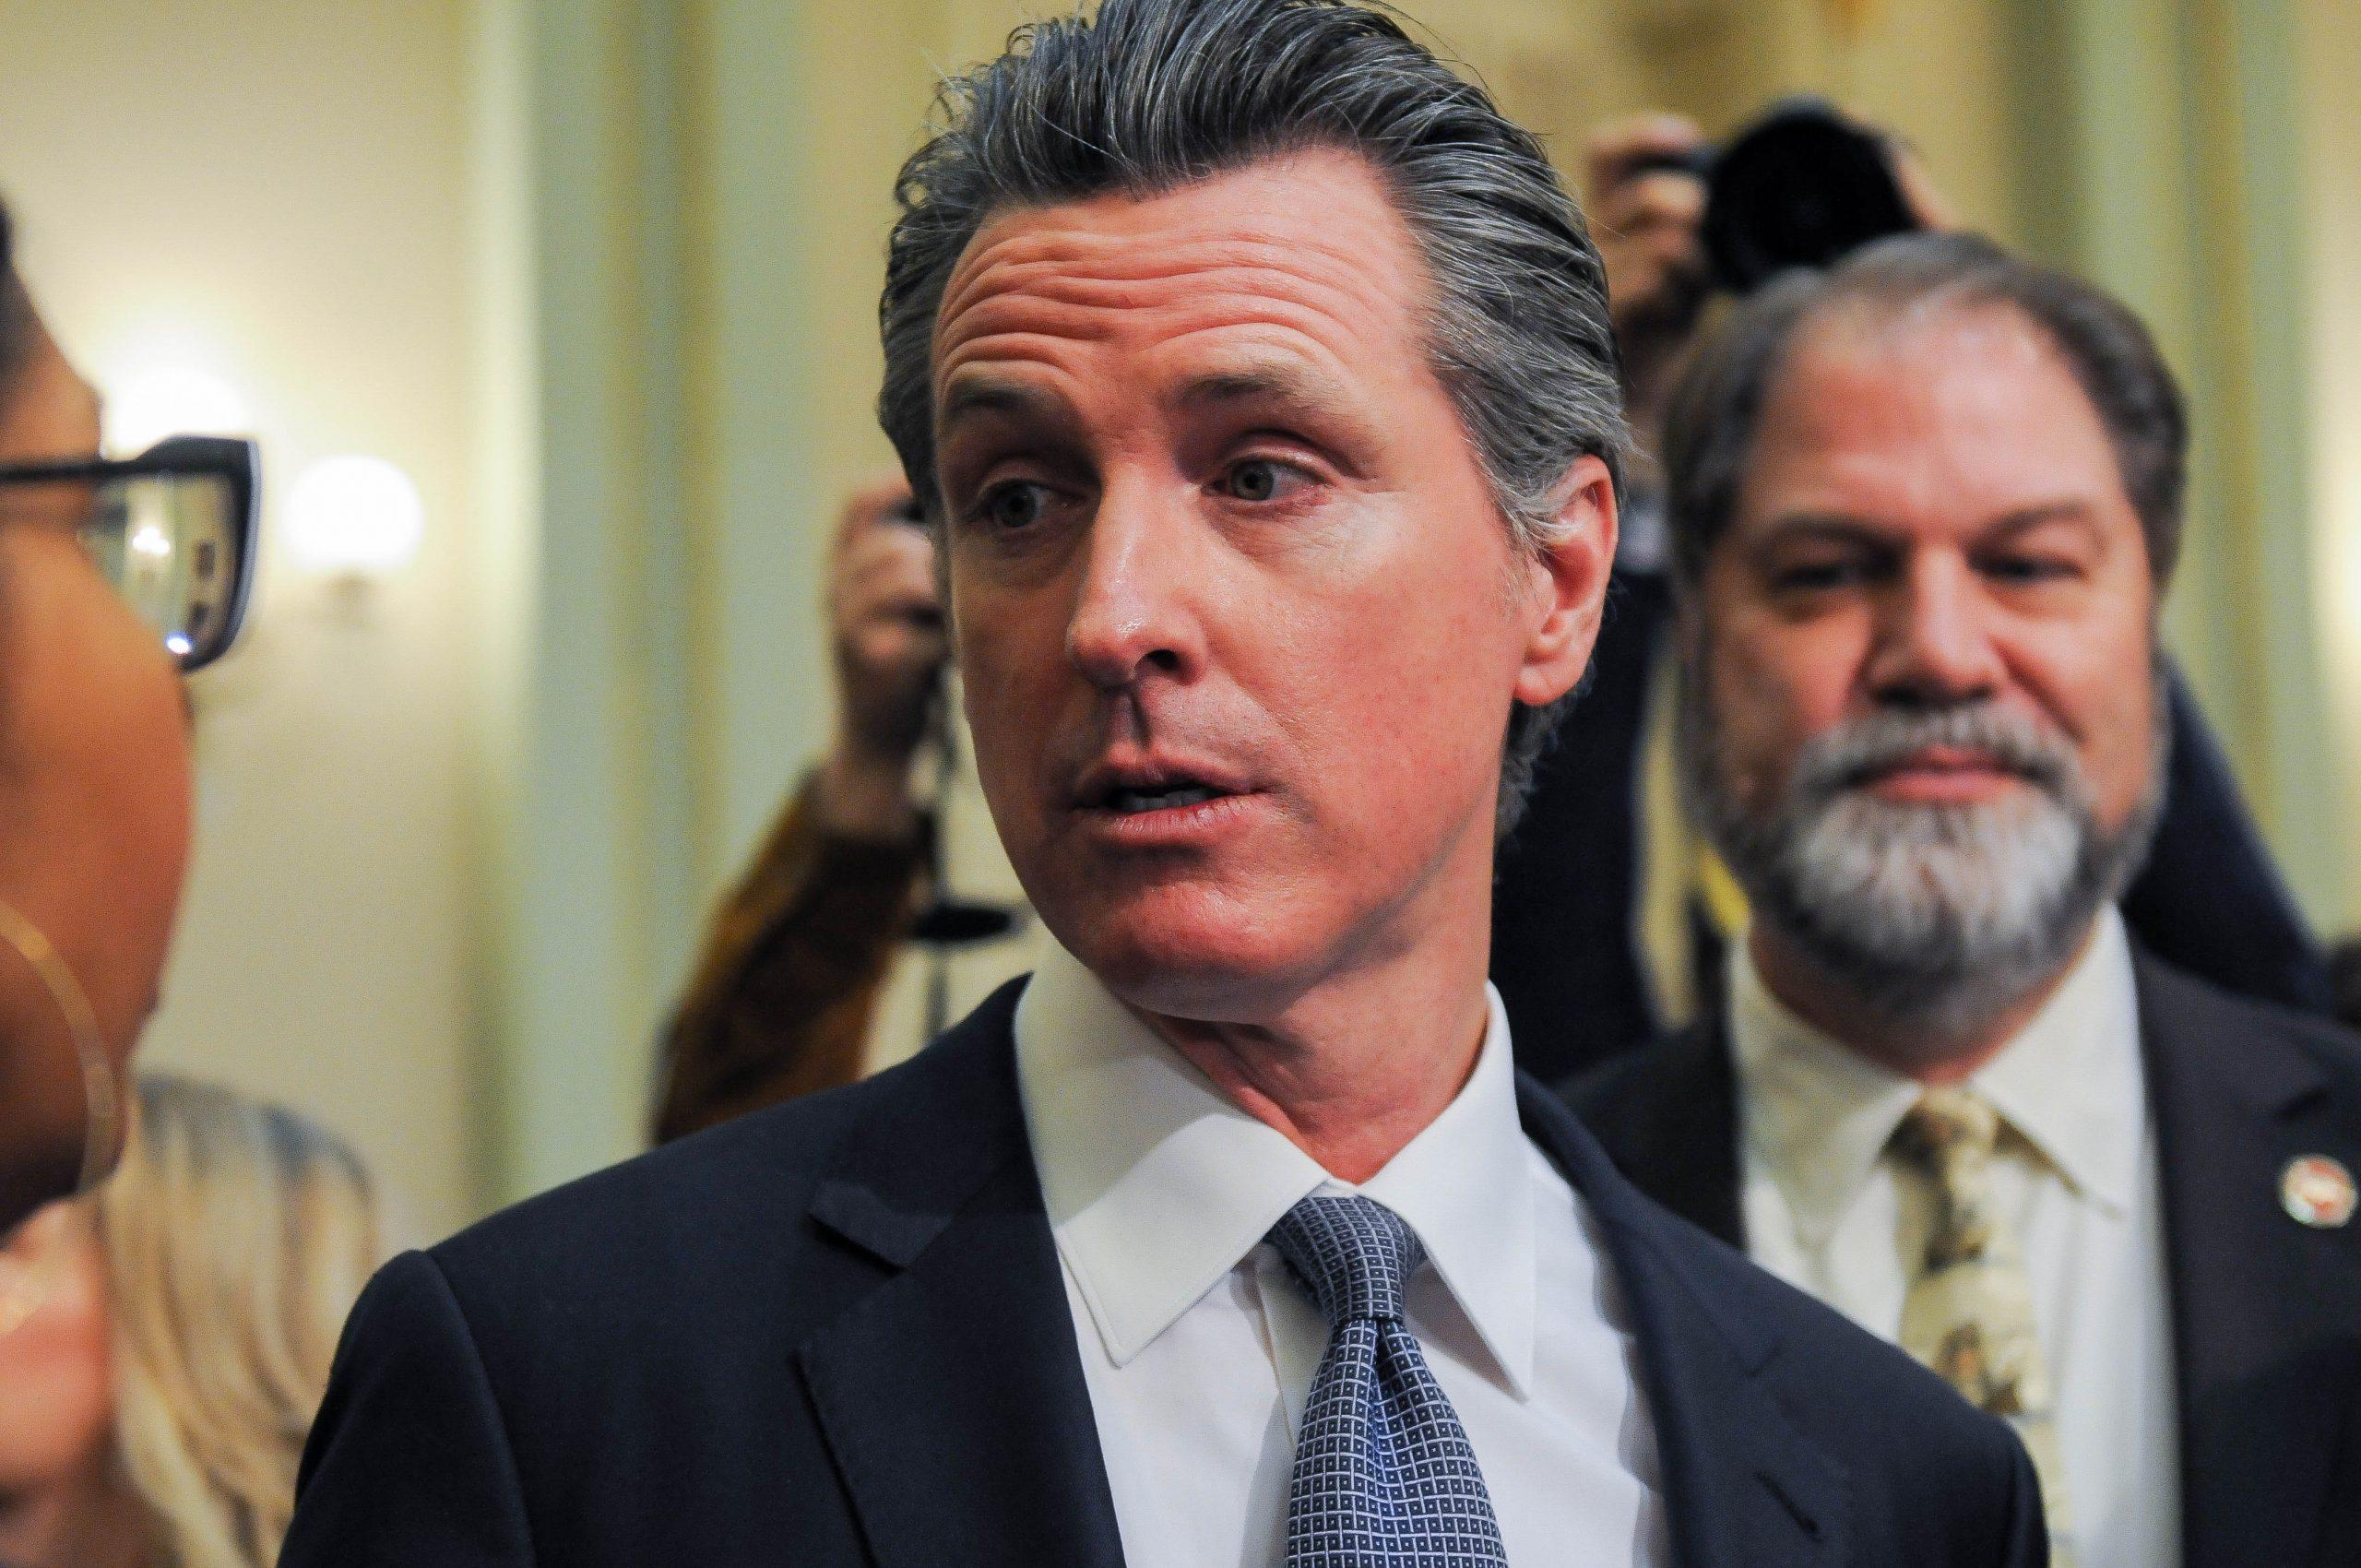 Gov. Newsom Replaces Orange County Water Board Member Over Desalination Plant - California Globe